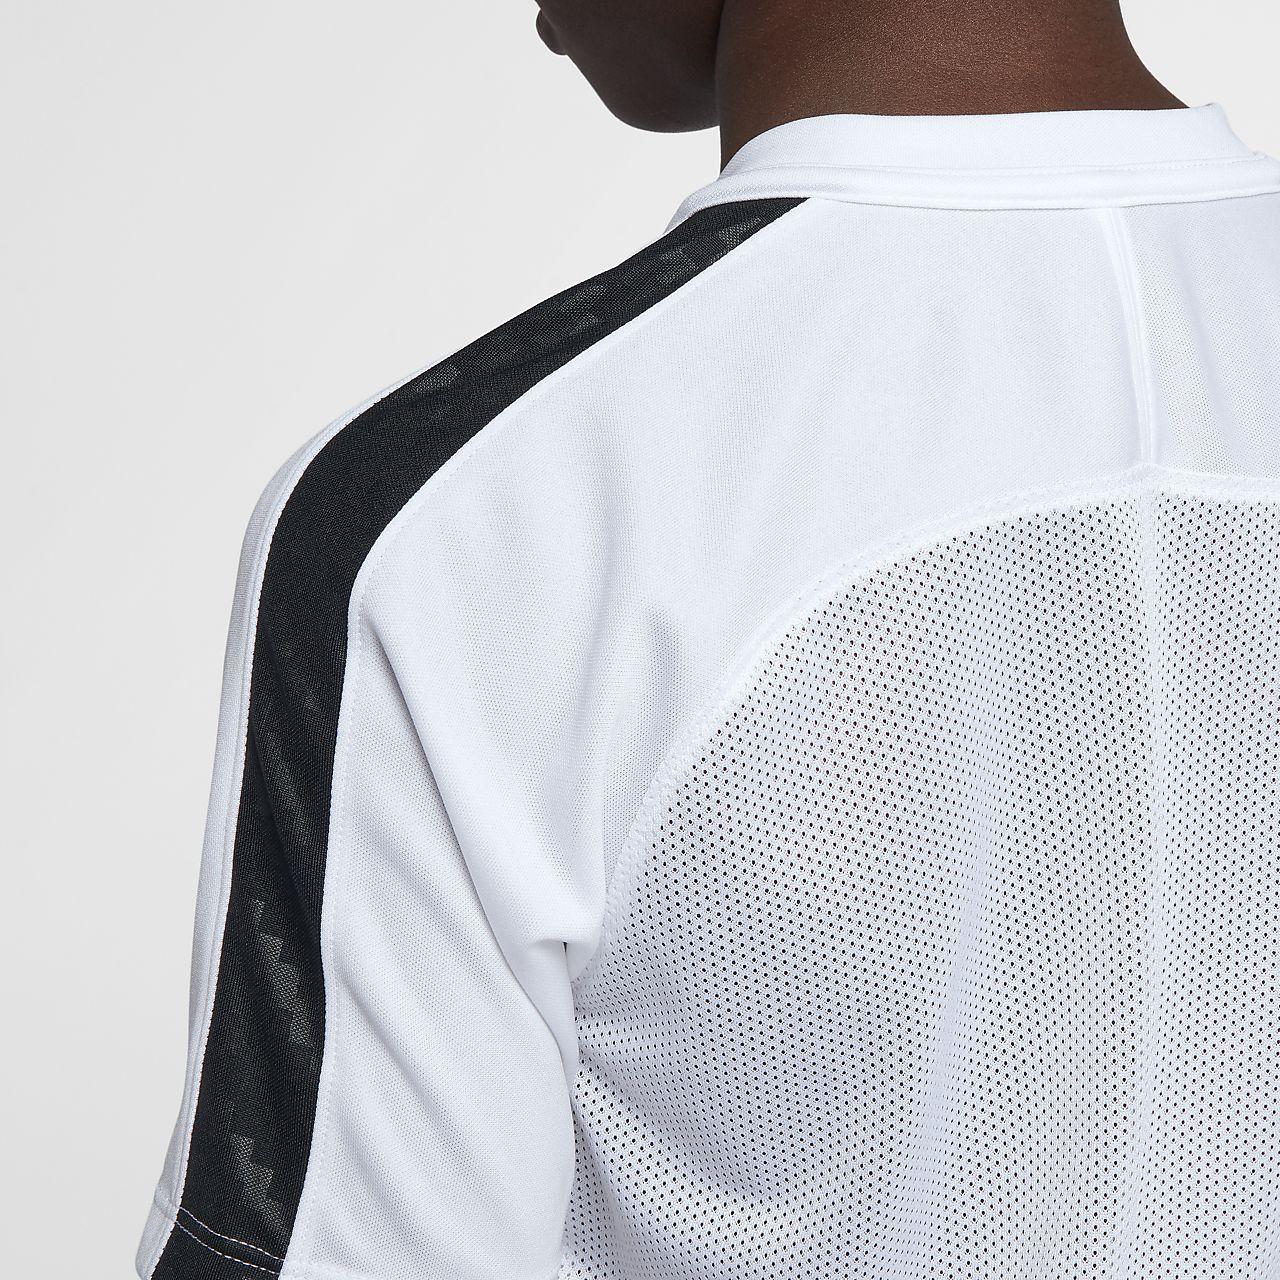 Nike Dri-FIT CR7 Camiseta de fútbol de manga corta - Niño. Nike.com ES ef3eec99ff1d8